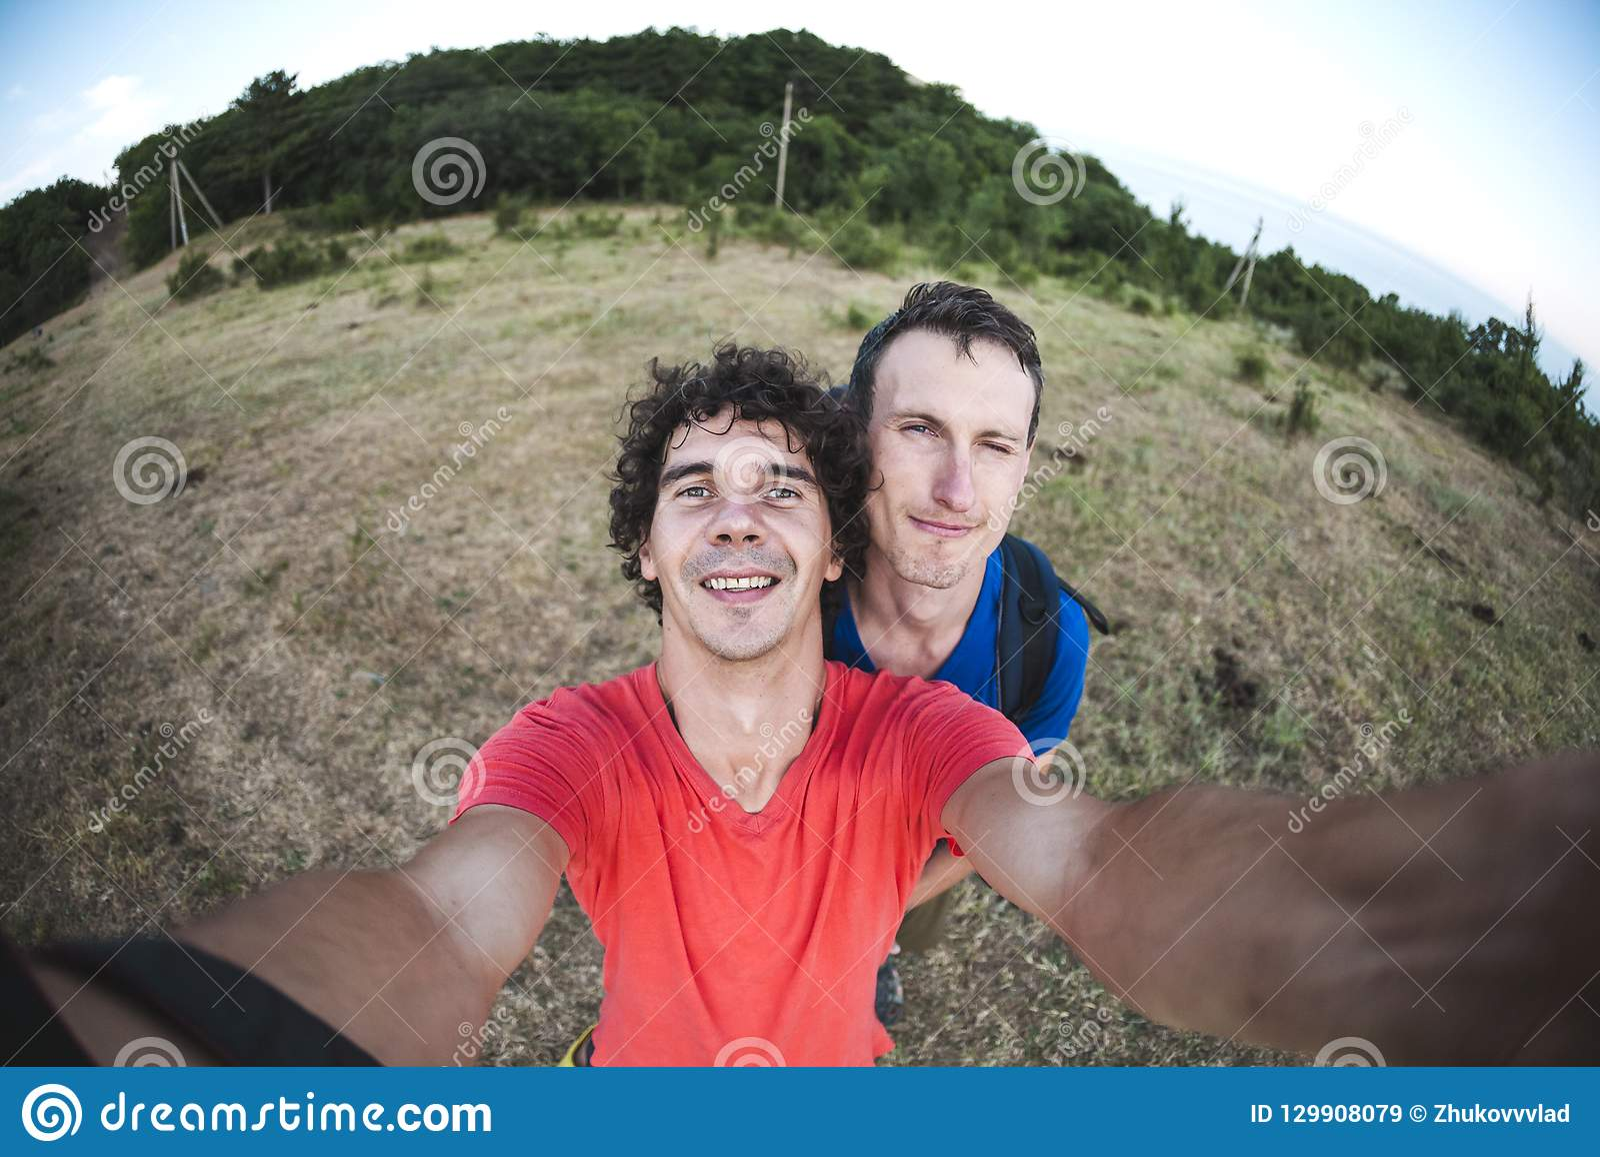 Selfie pics of guys